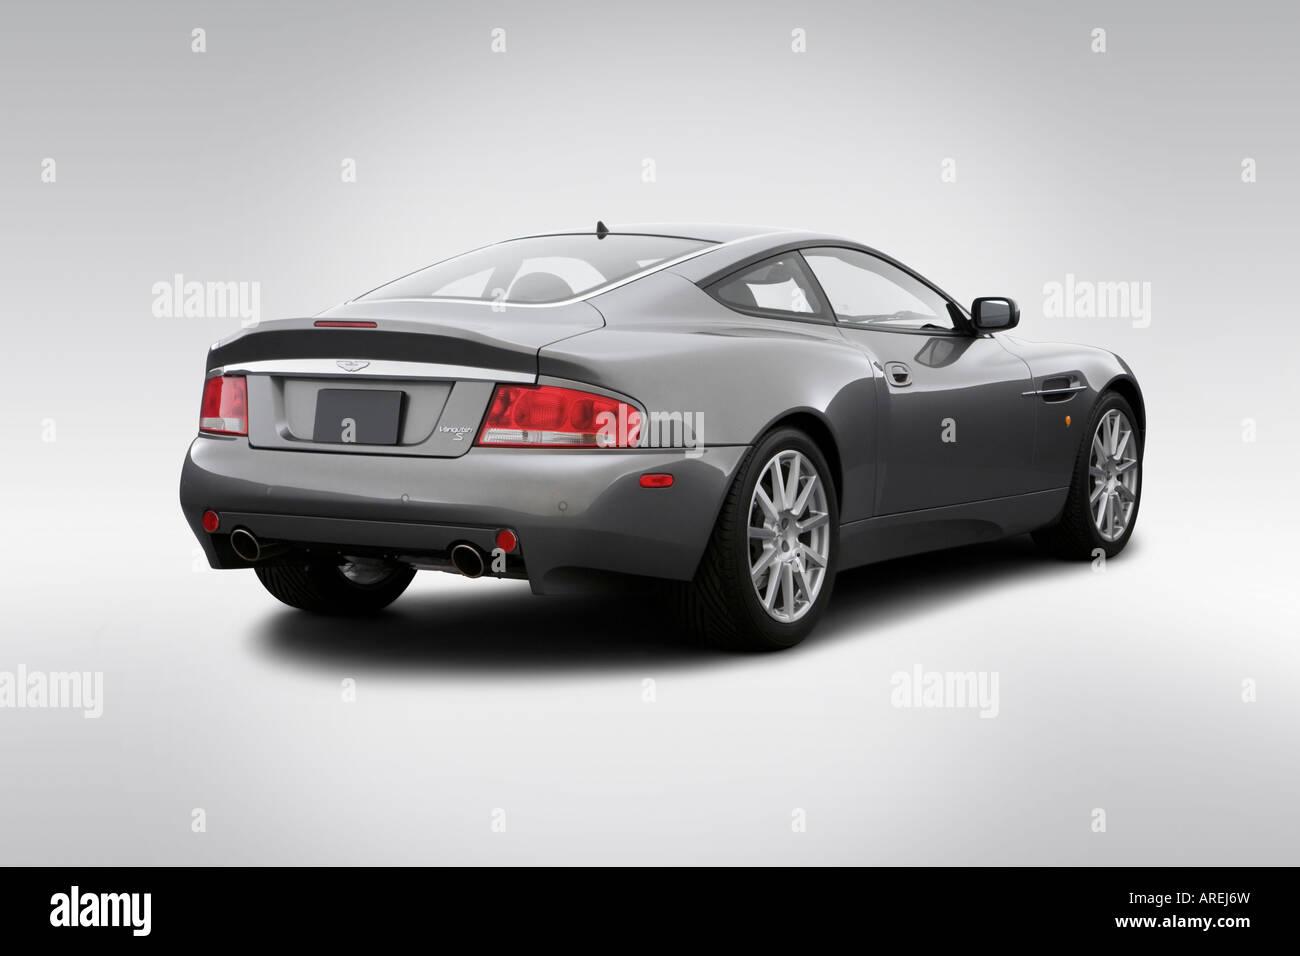 2006 Aston Martin V12 Vanquish S In Silber Winkel Rückansicht Stockfotografie Alamy